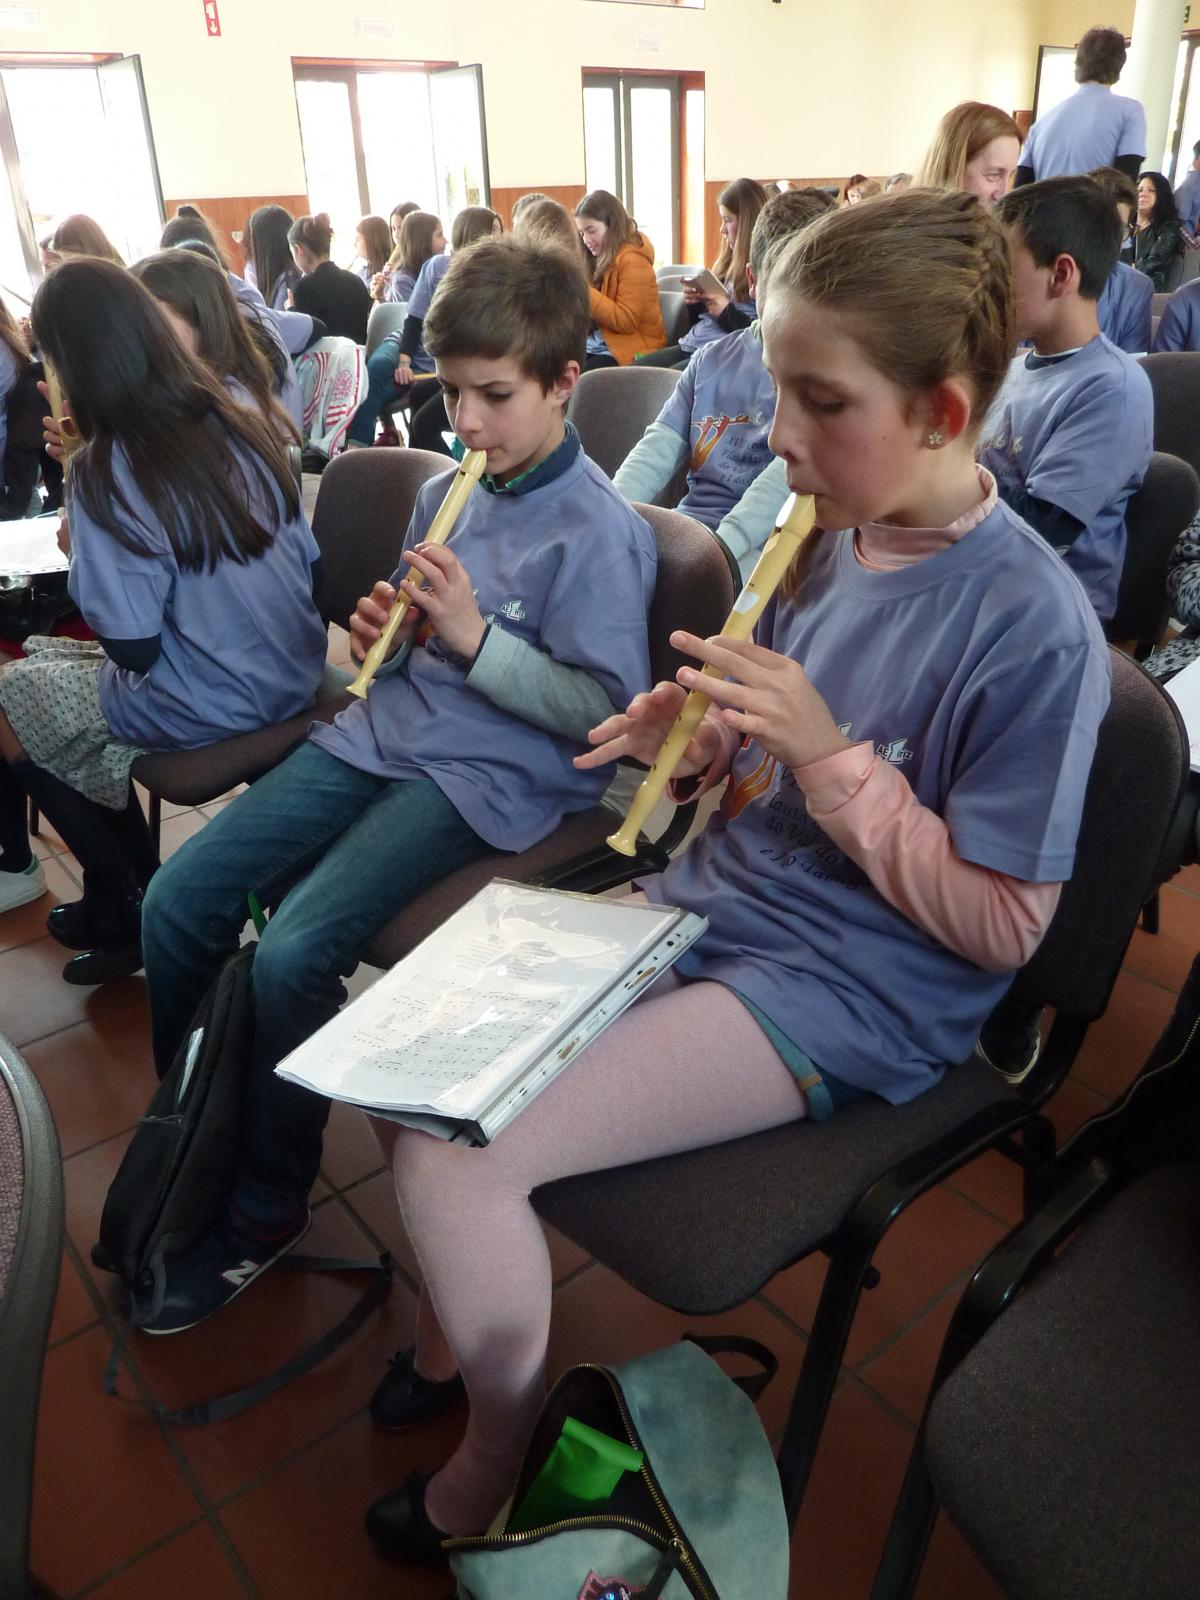 XVIII Concurso de Flauta de Bisel das Escolas de Vale do Sousa - I Tâmega